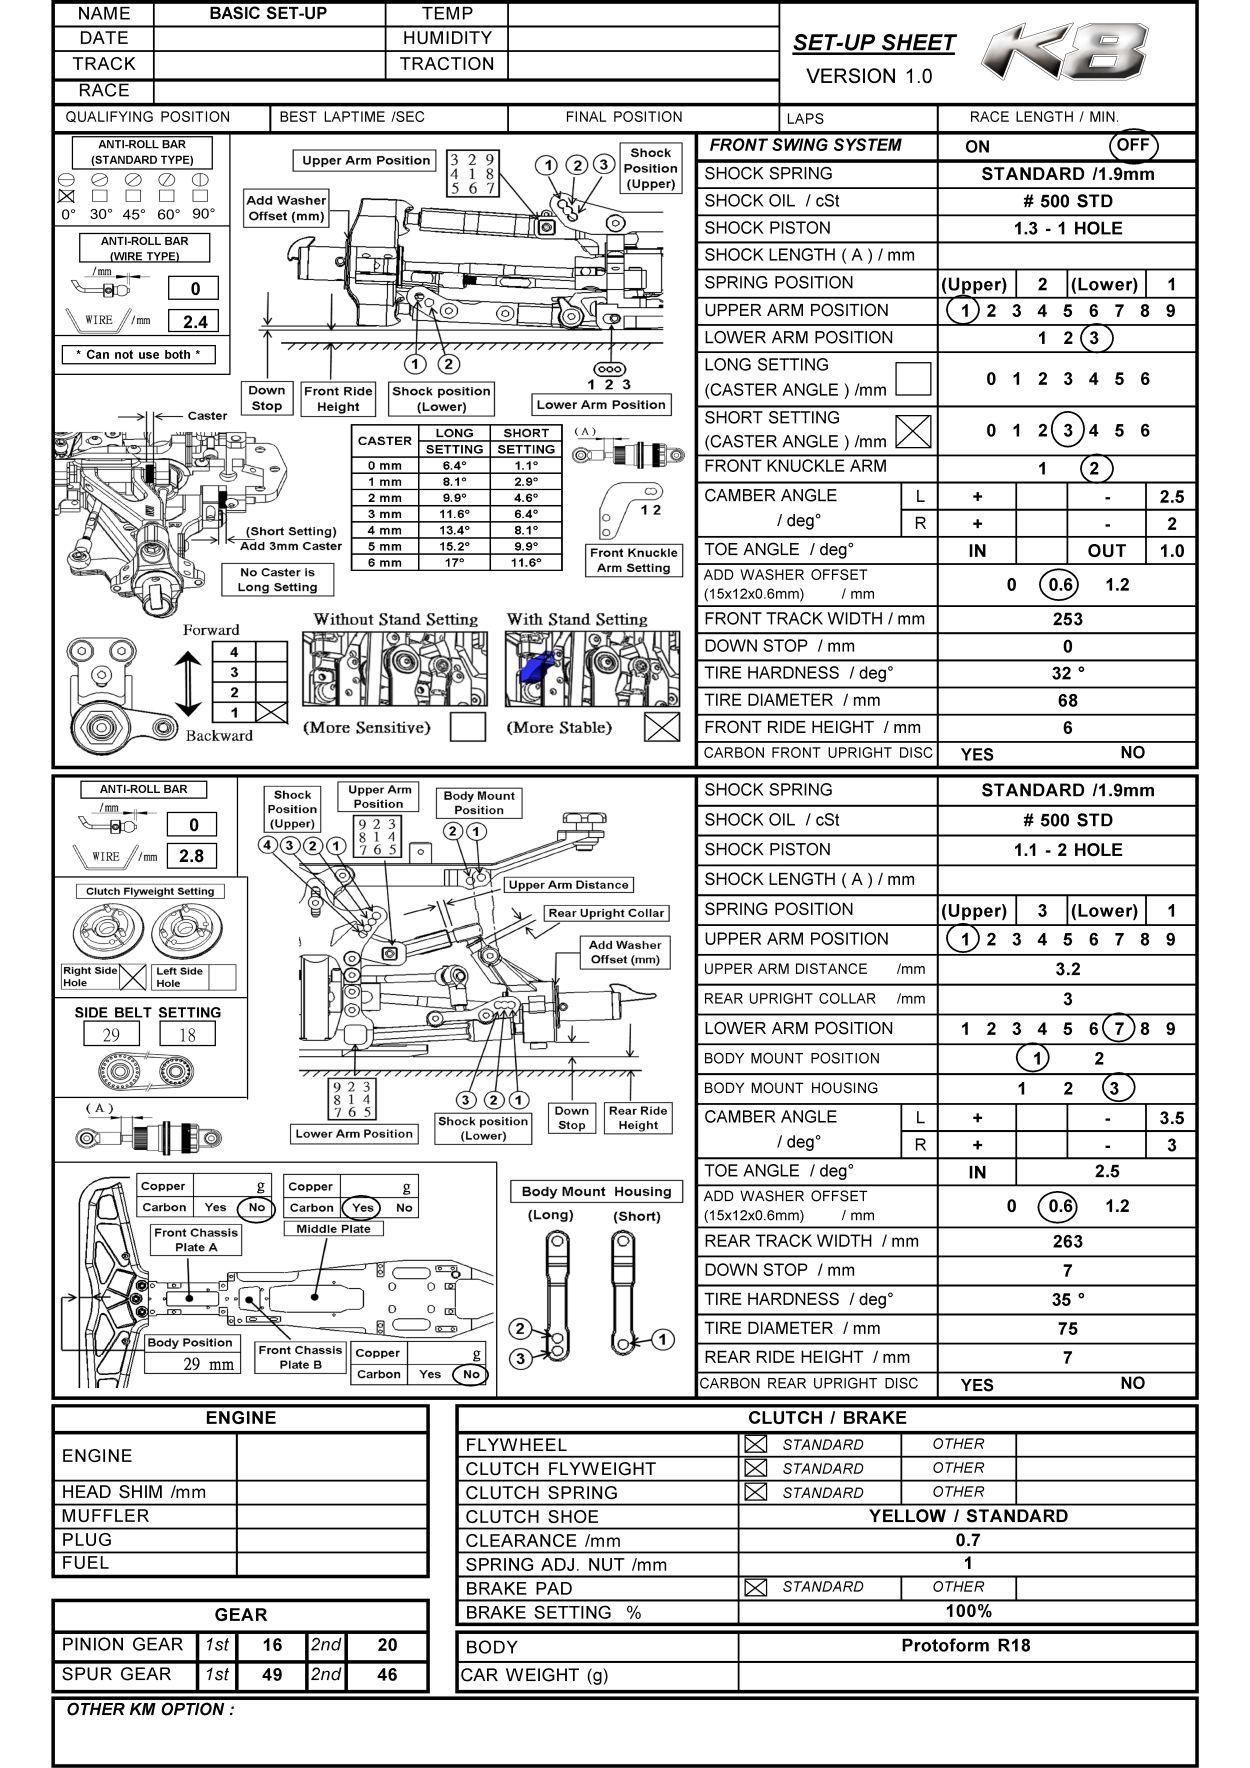 H-K1 Setting Sheet and Instruction Manual « KM Group